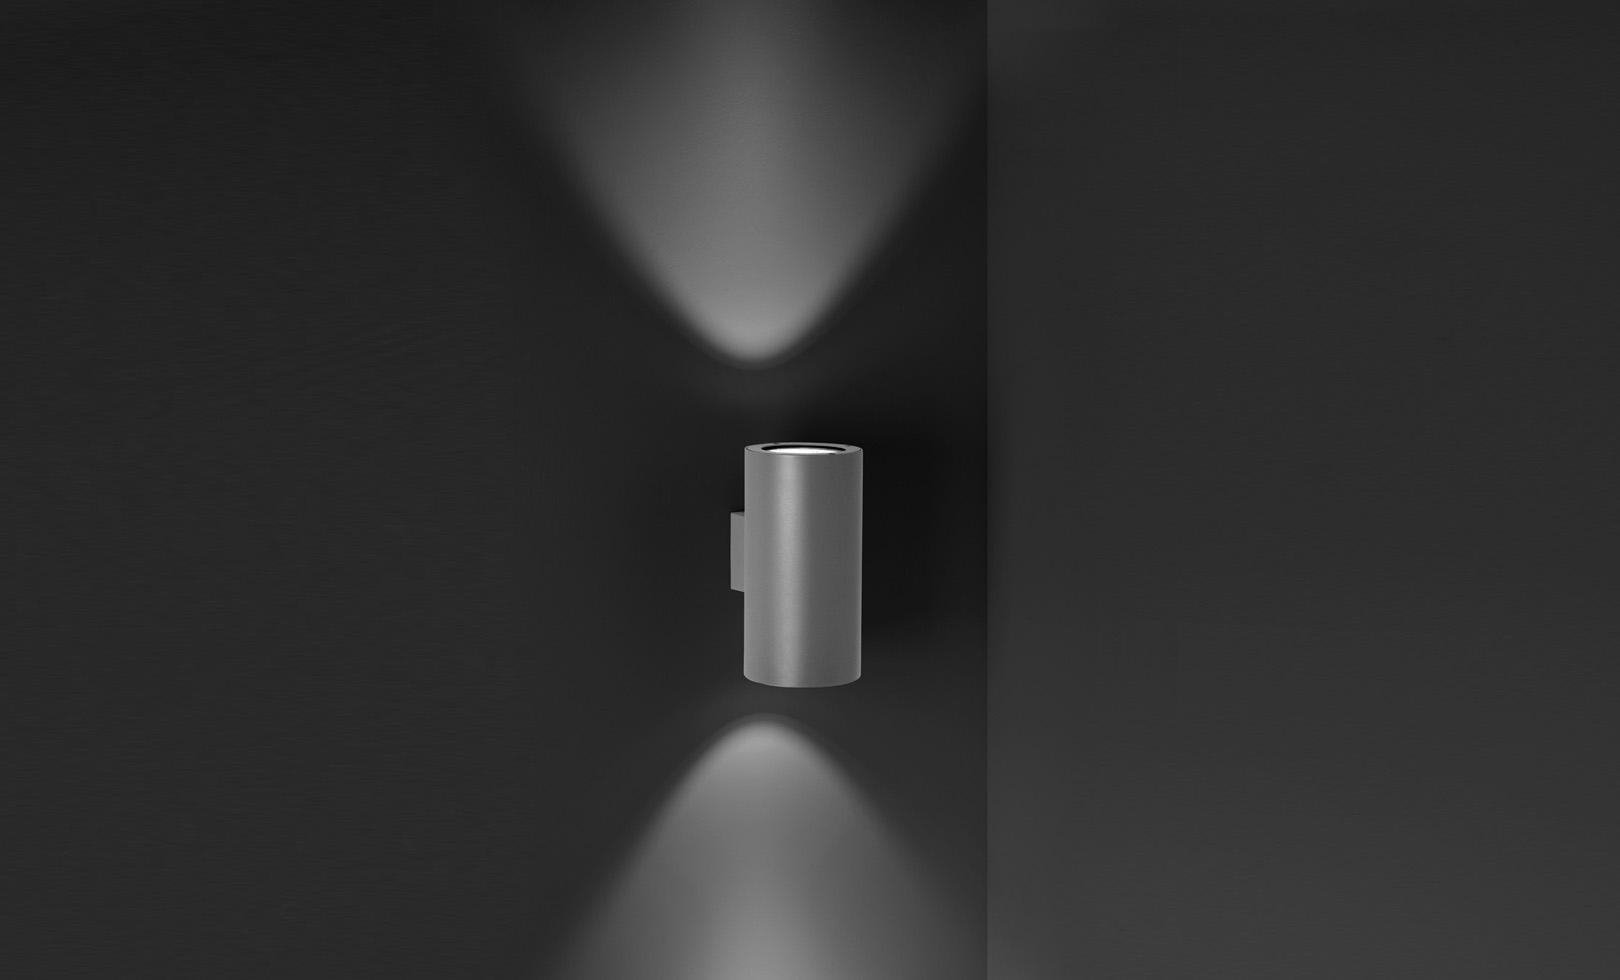 401010 TECH MAXI 02 ROUND LED 2x39W 1